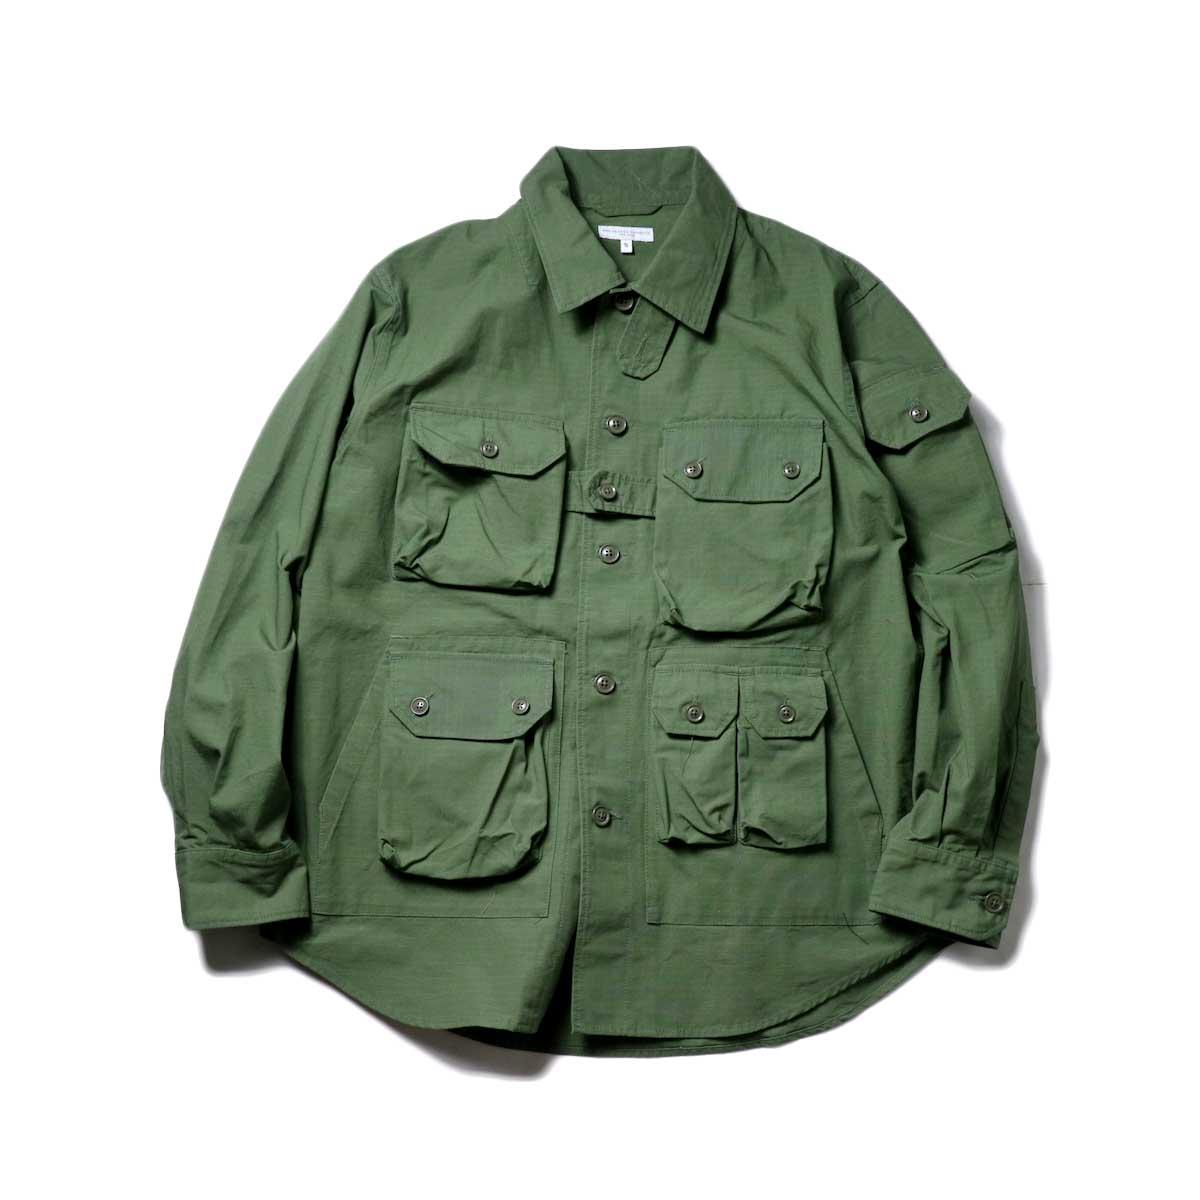 Engineered Garments / Explorer Shirt Jacket -Cotton Ripstop (Olive)